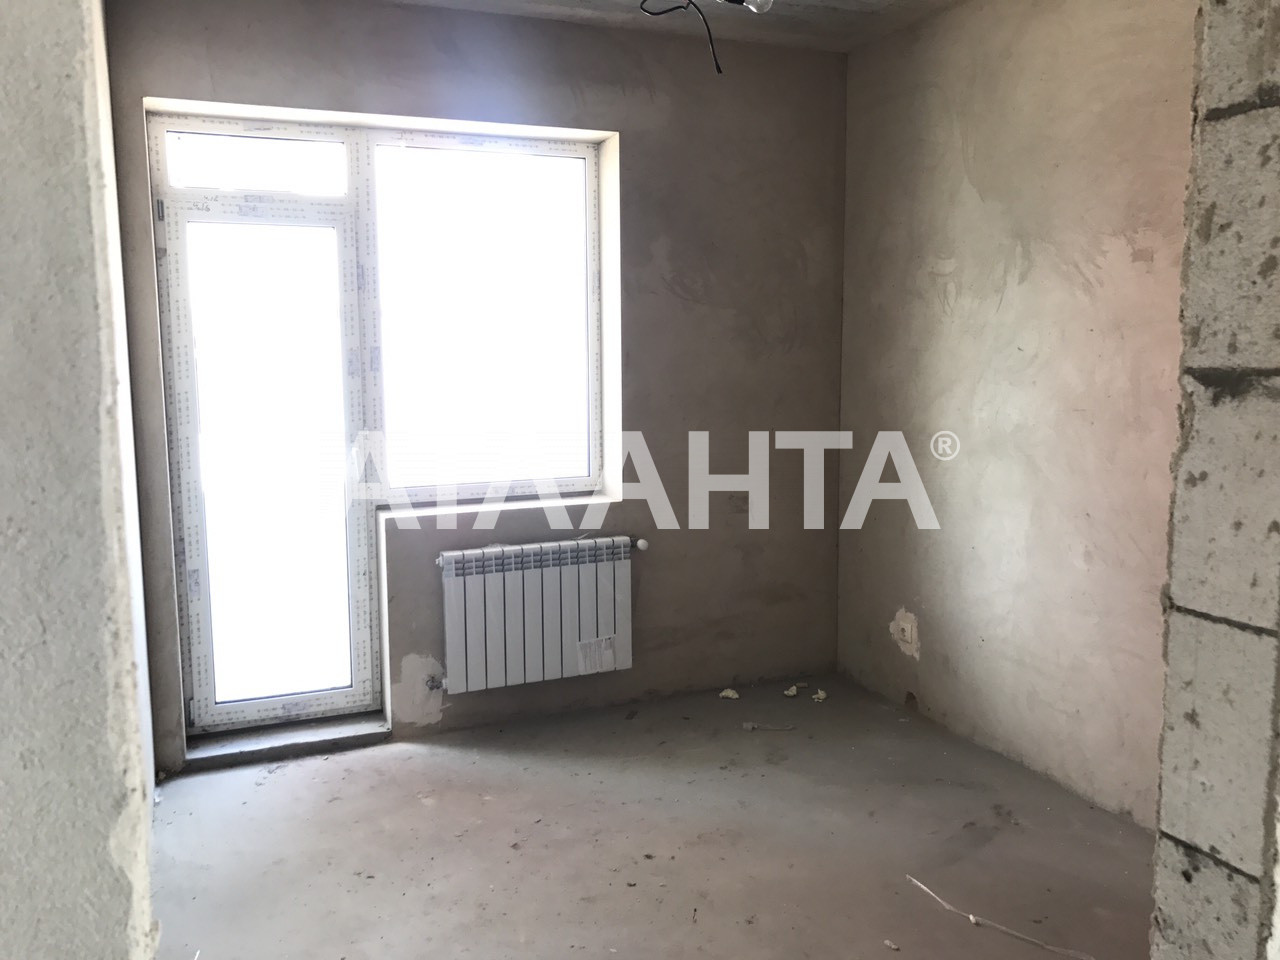 Продается 3-комнатная Квартира на ул. Валовня — 49 000 у.е. (фото №6)